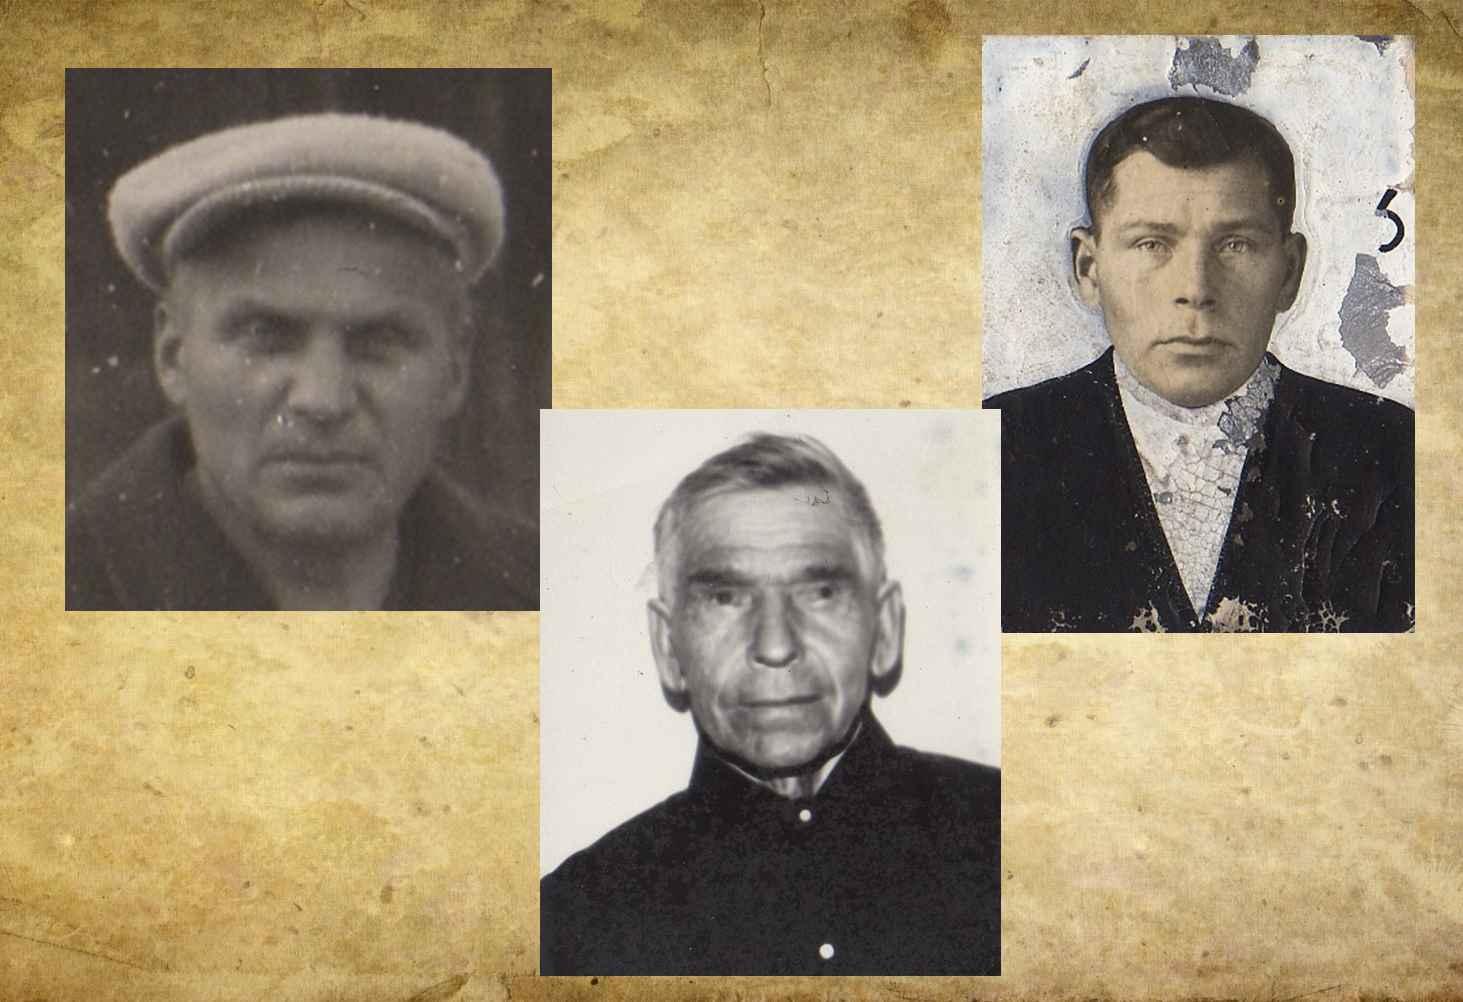 dimovidovy-geroicheskaya-istoriya-semi